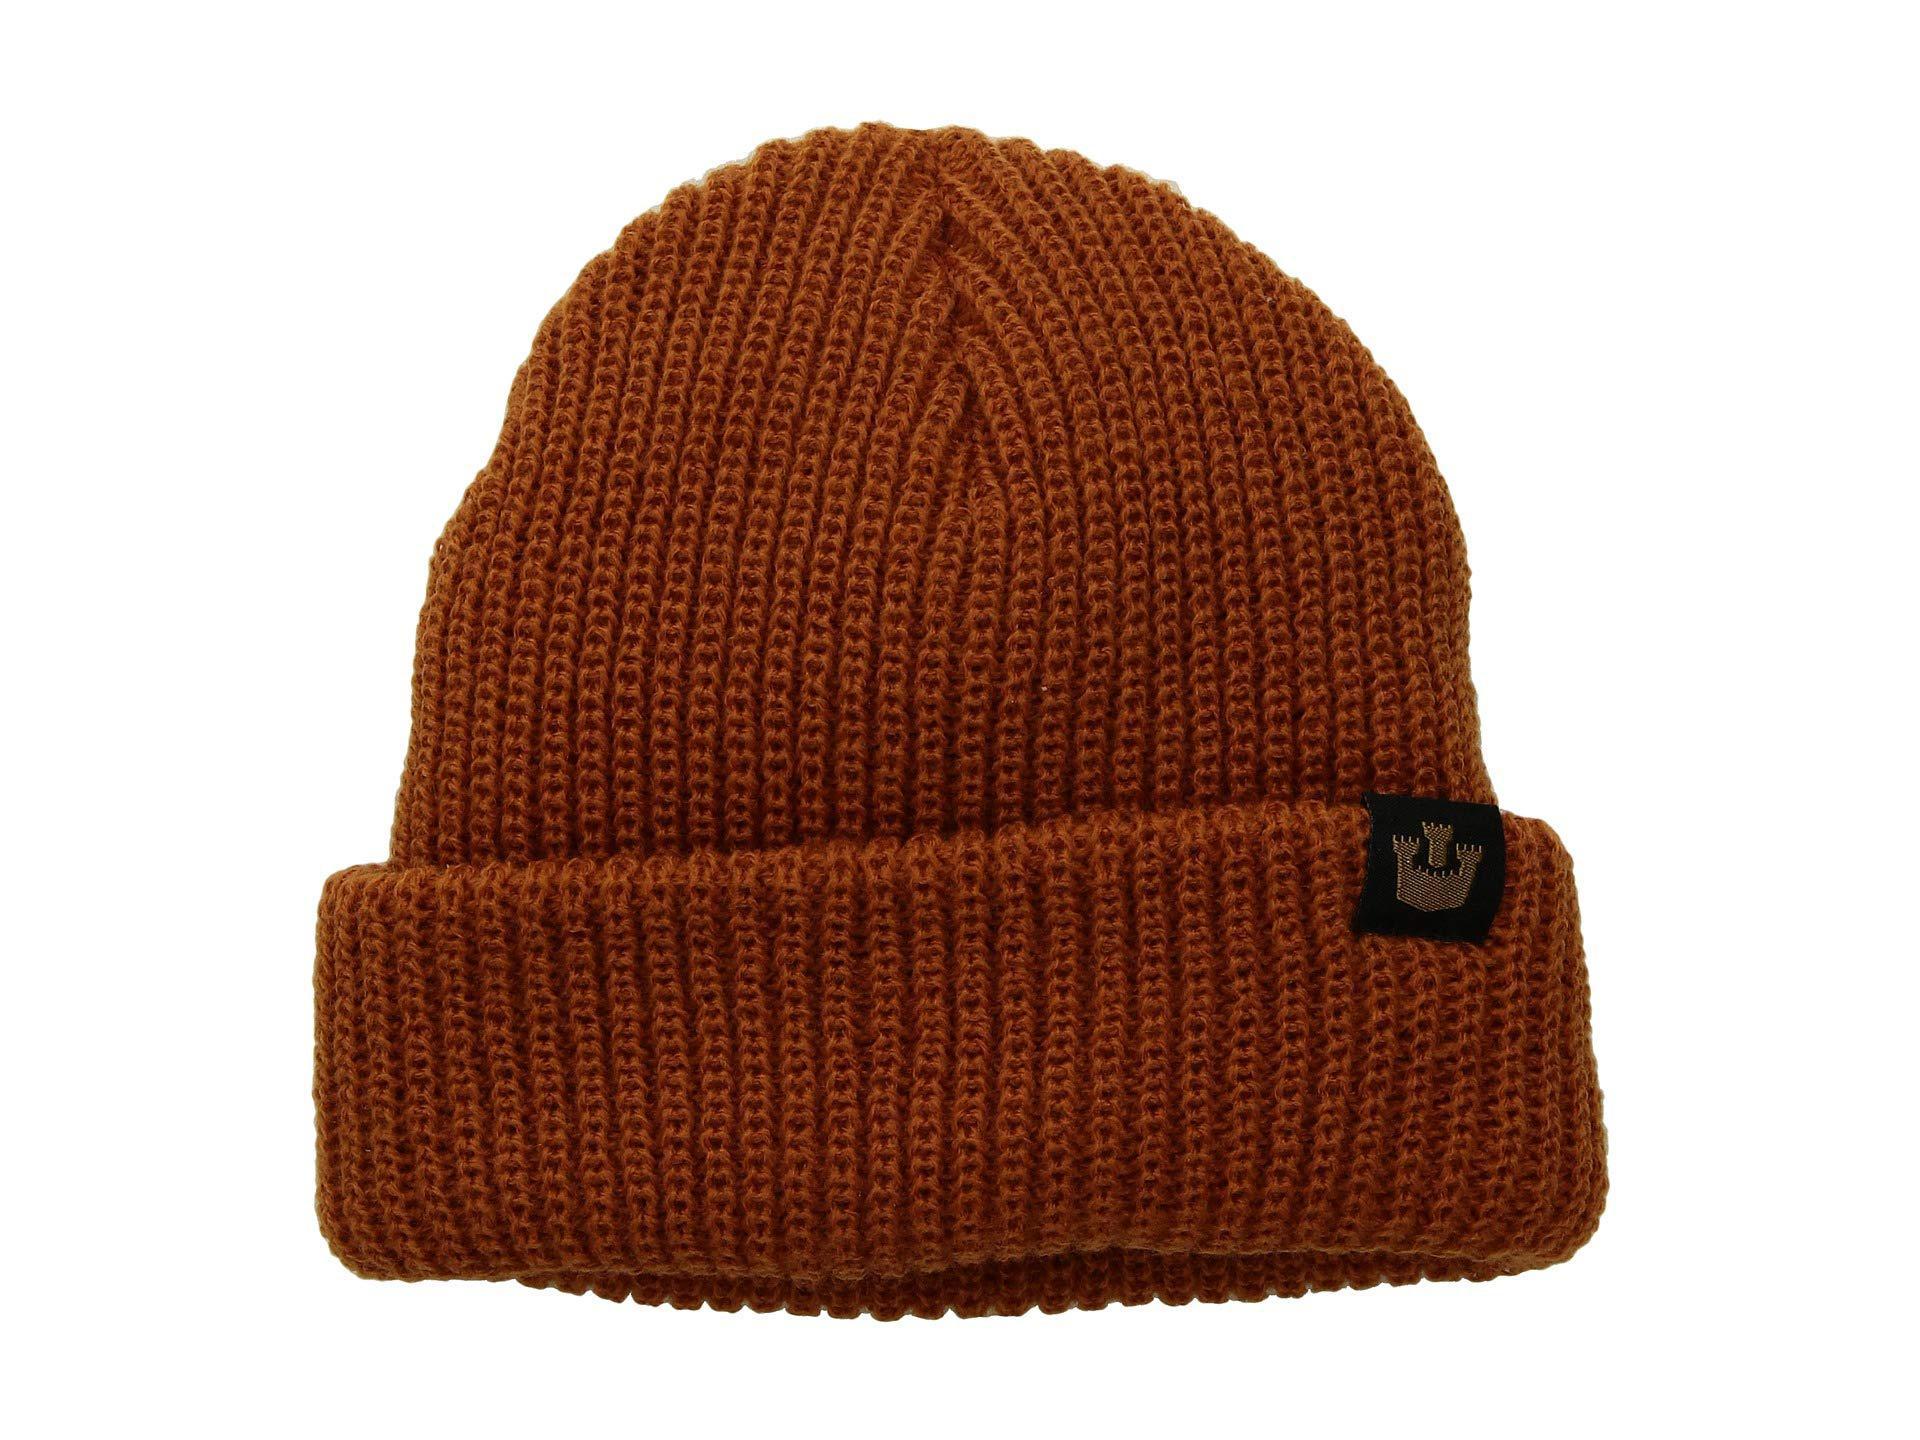 0408e65d2e8 Lyst - Goorin Bros Fresh Tracks (orange) Caps in Orange for Men